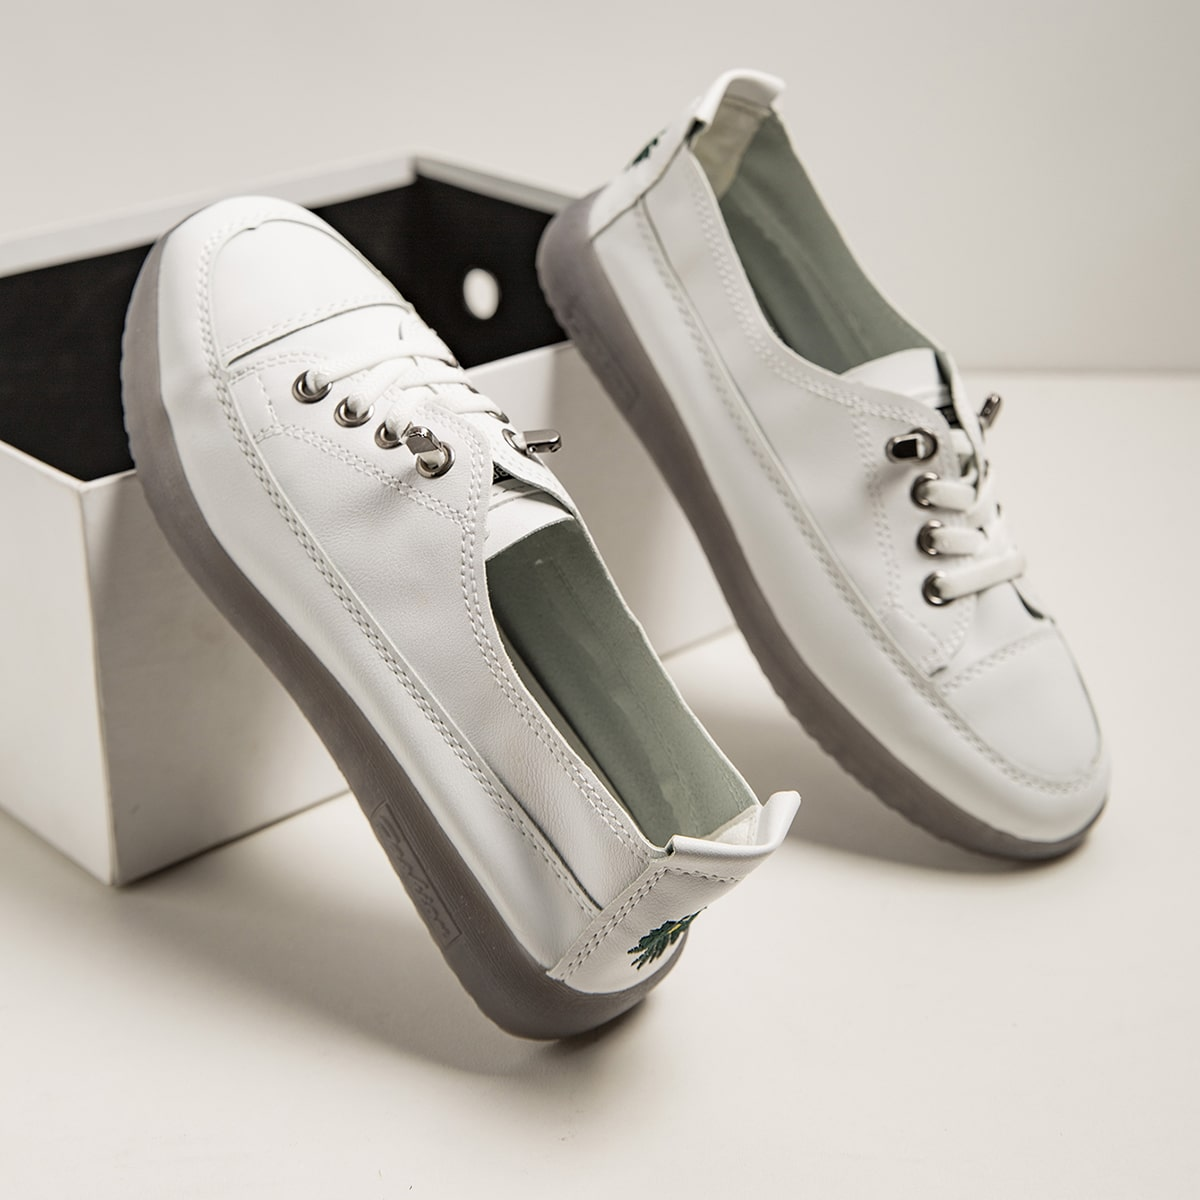 shein Kant Preppy Bloemen Sneaker Borduurwerk